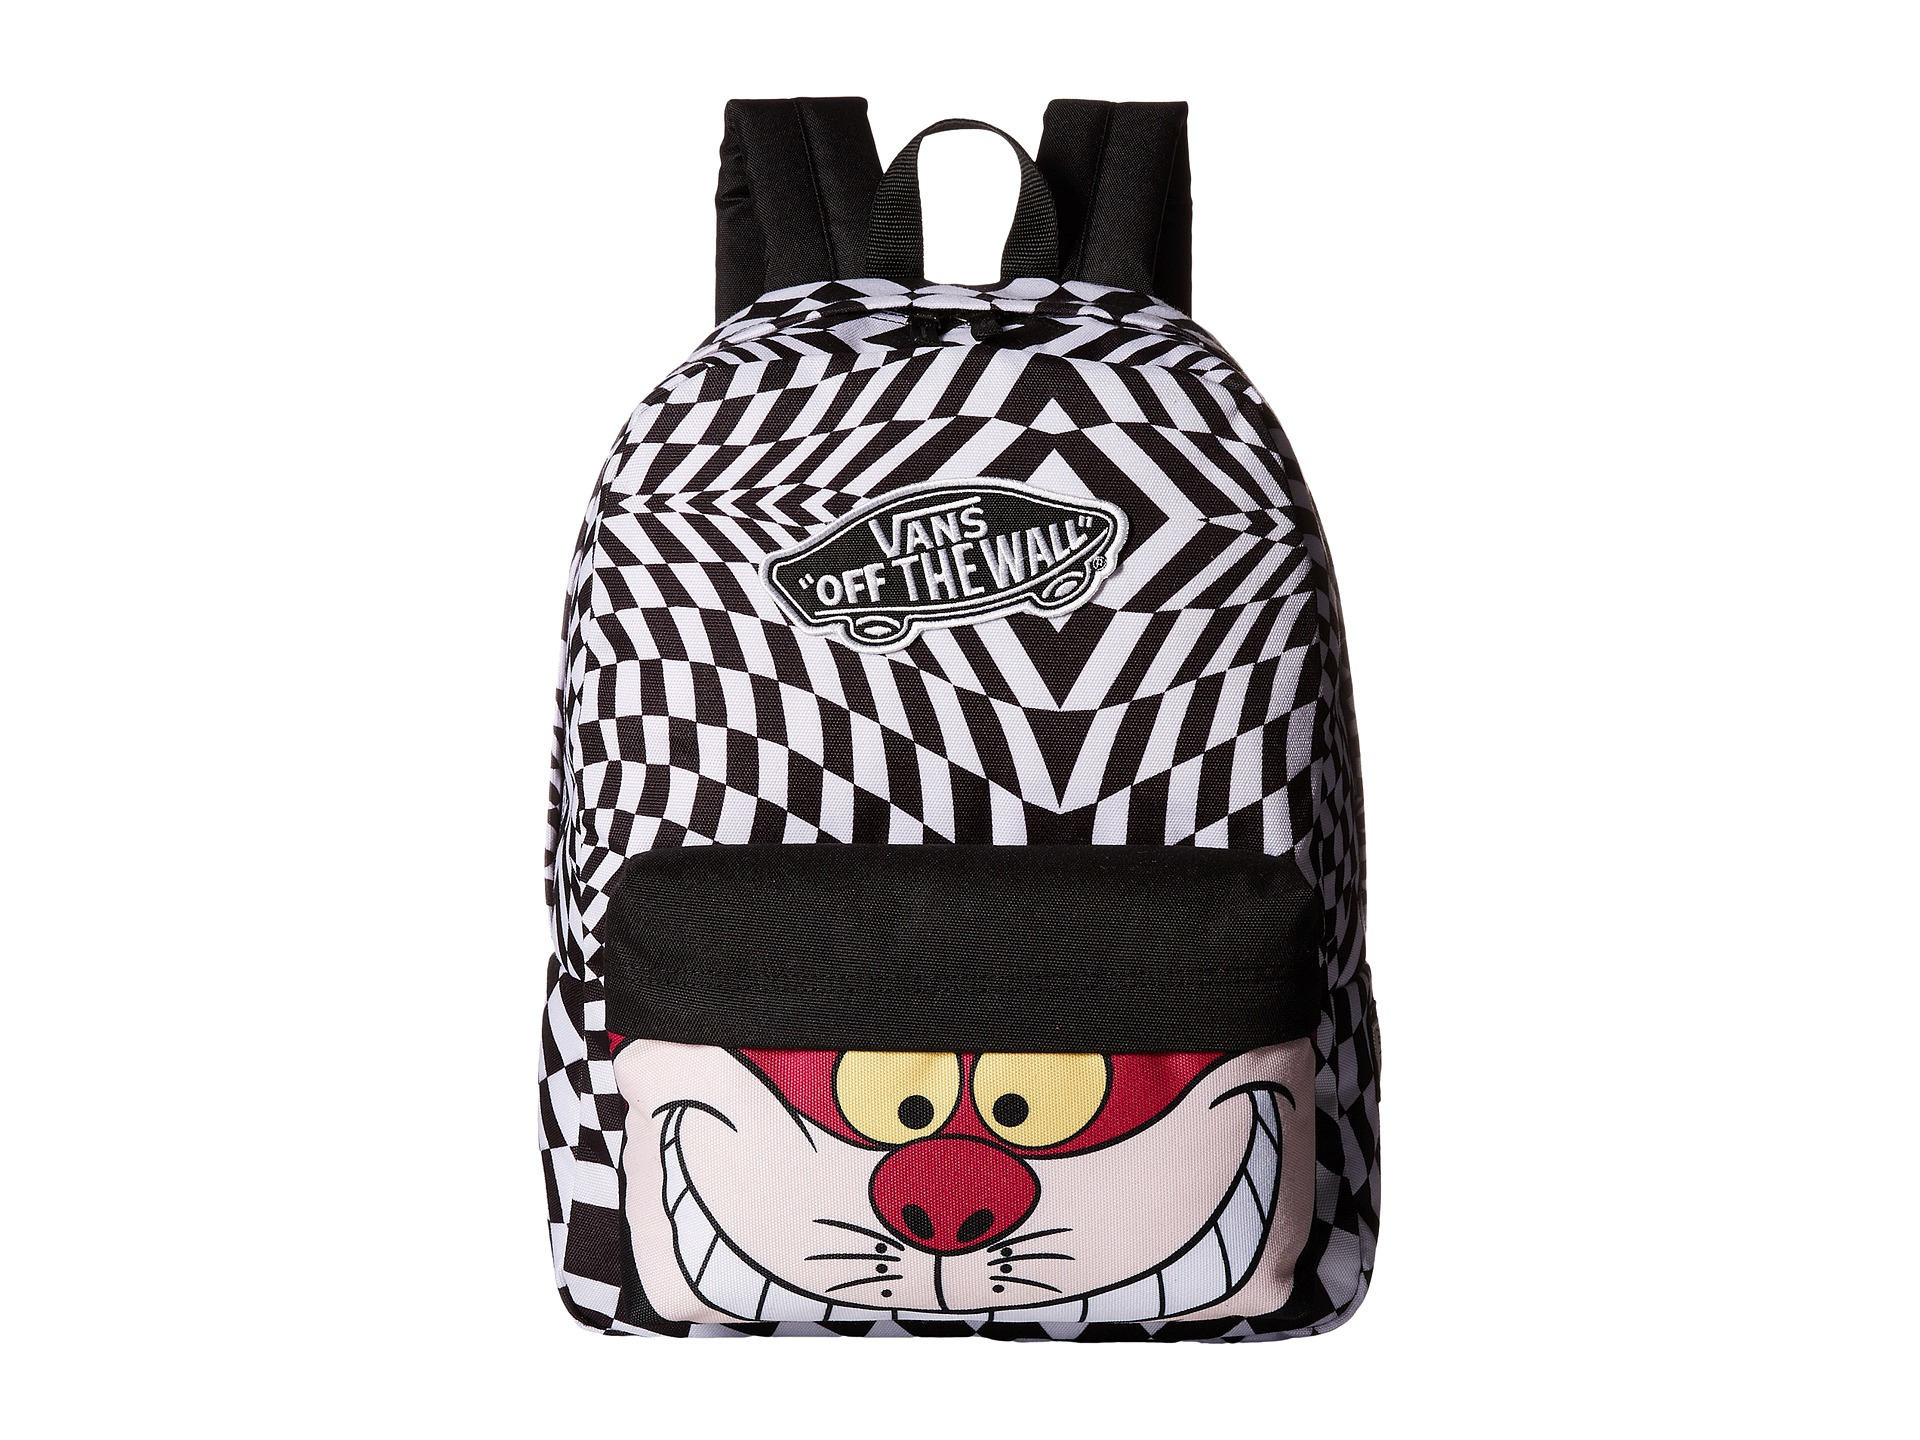 ff944611d83 Lyst - Vans Disney Backpack